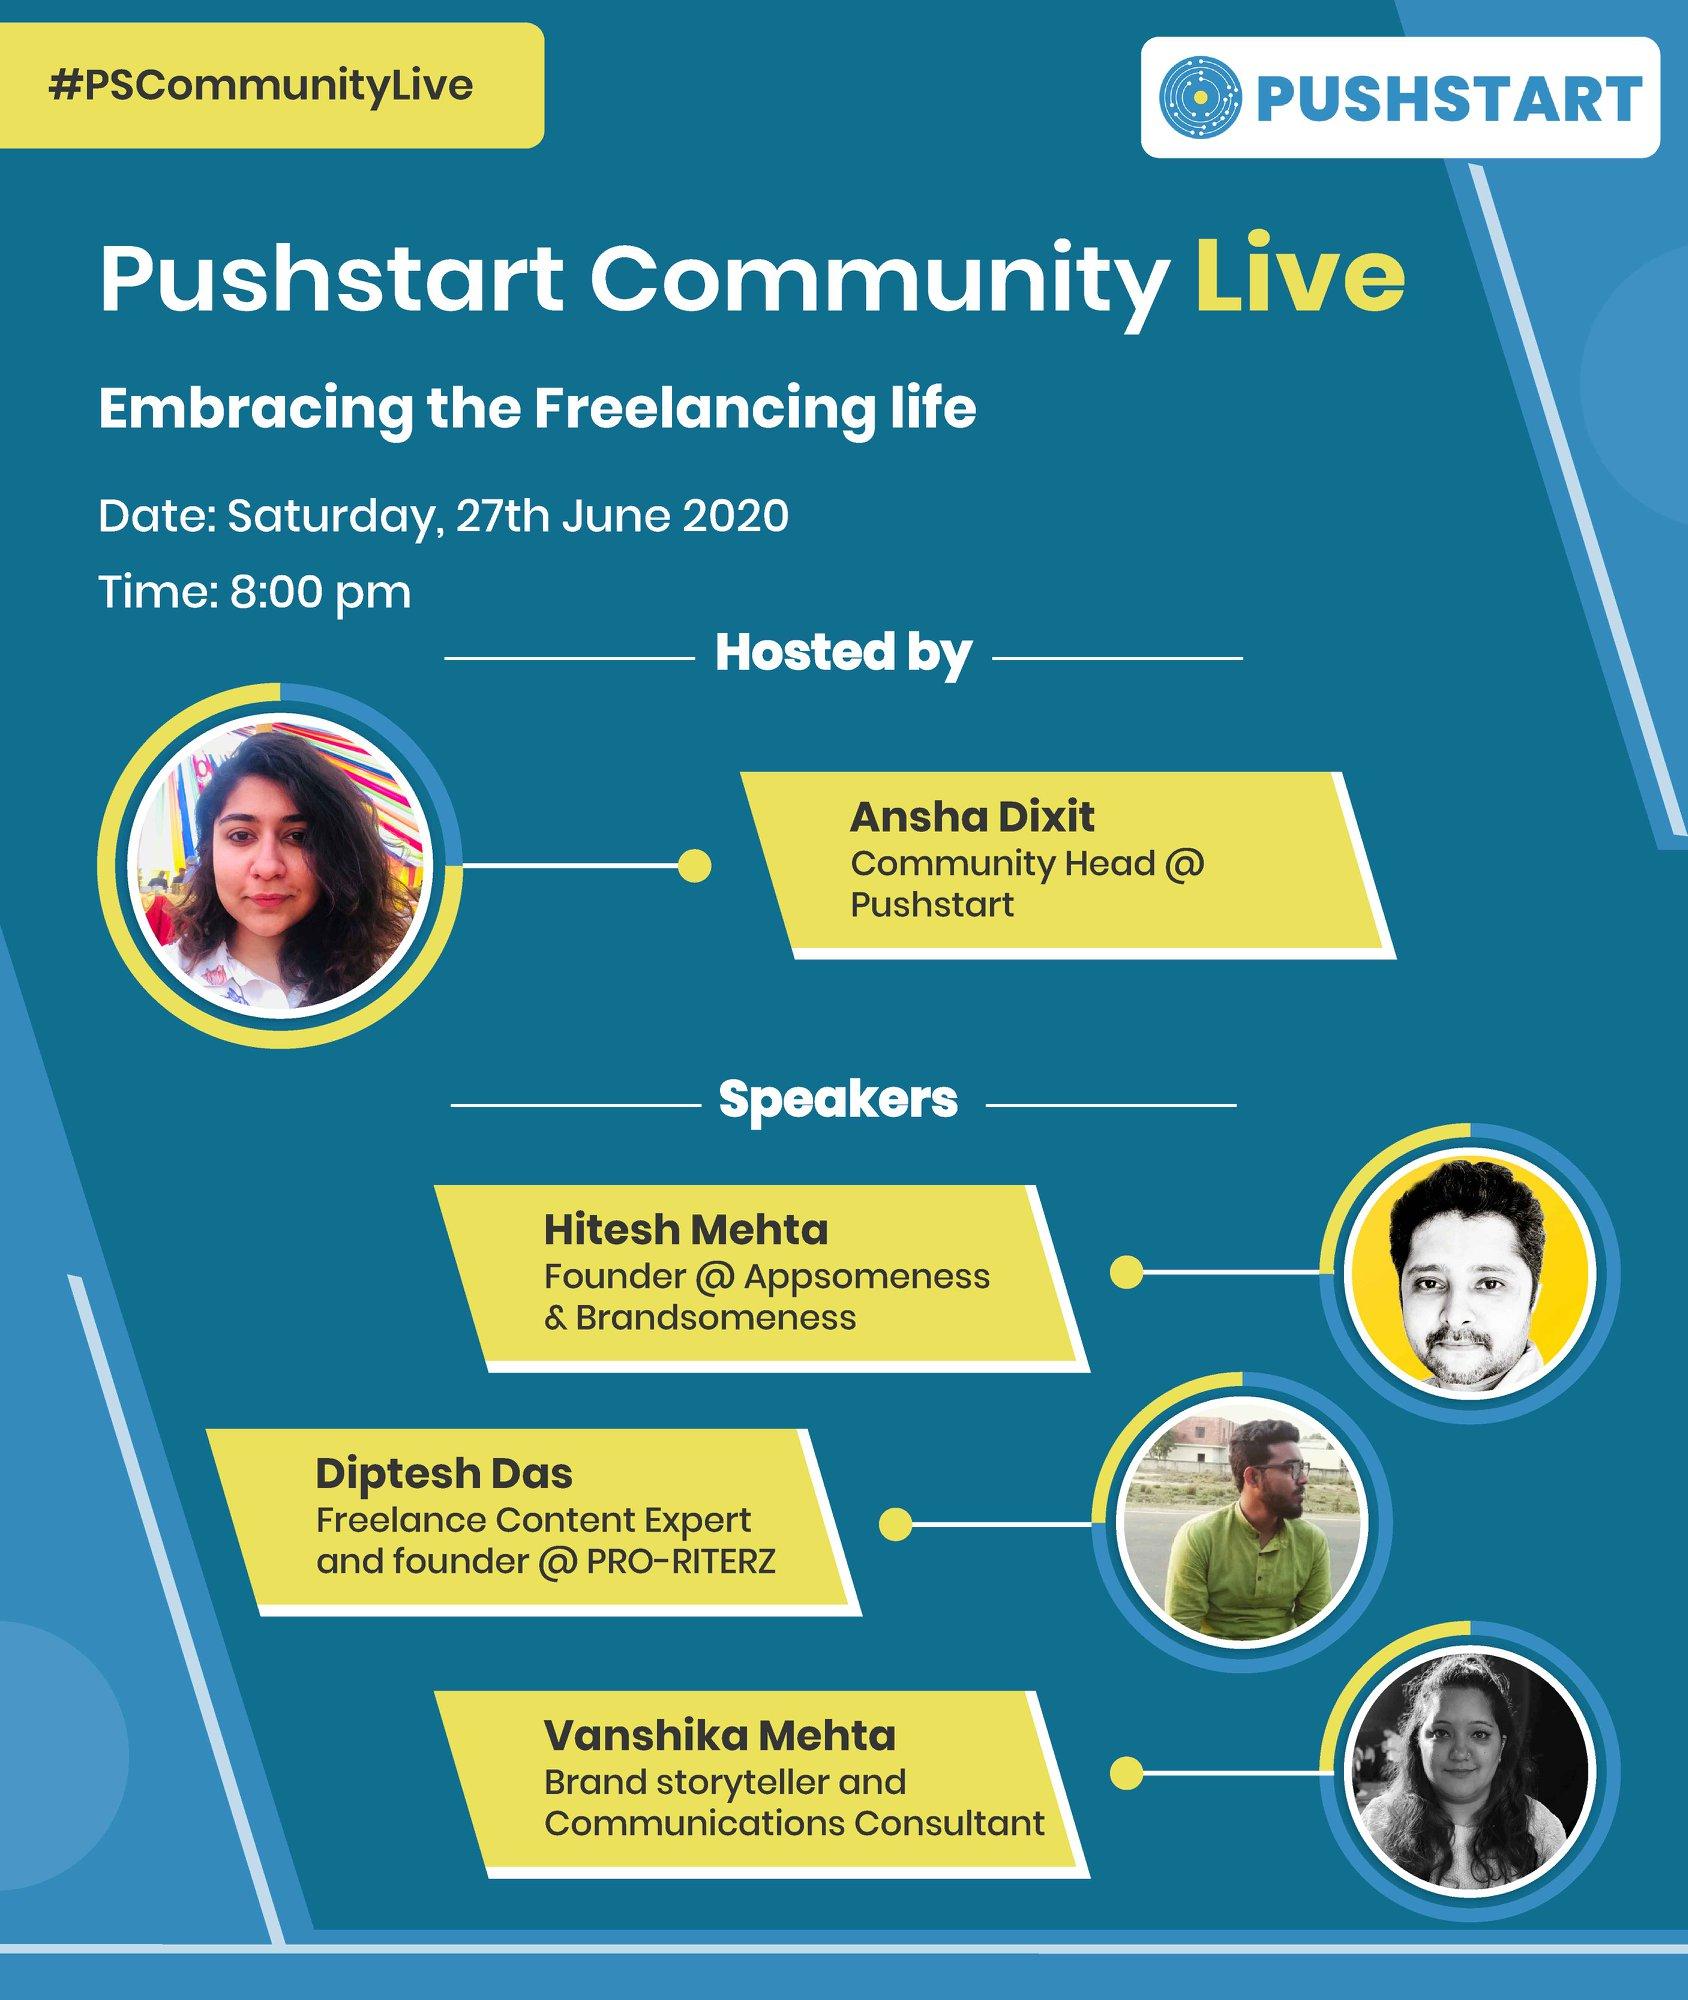 Embracing the freelancing lifestyle, Pushstart [27 June 2020]